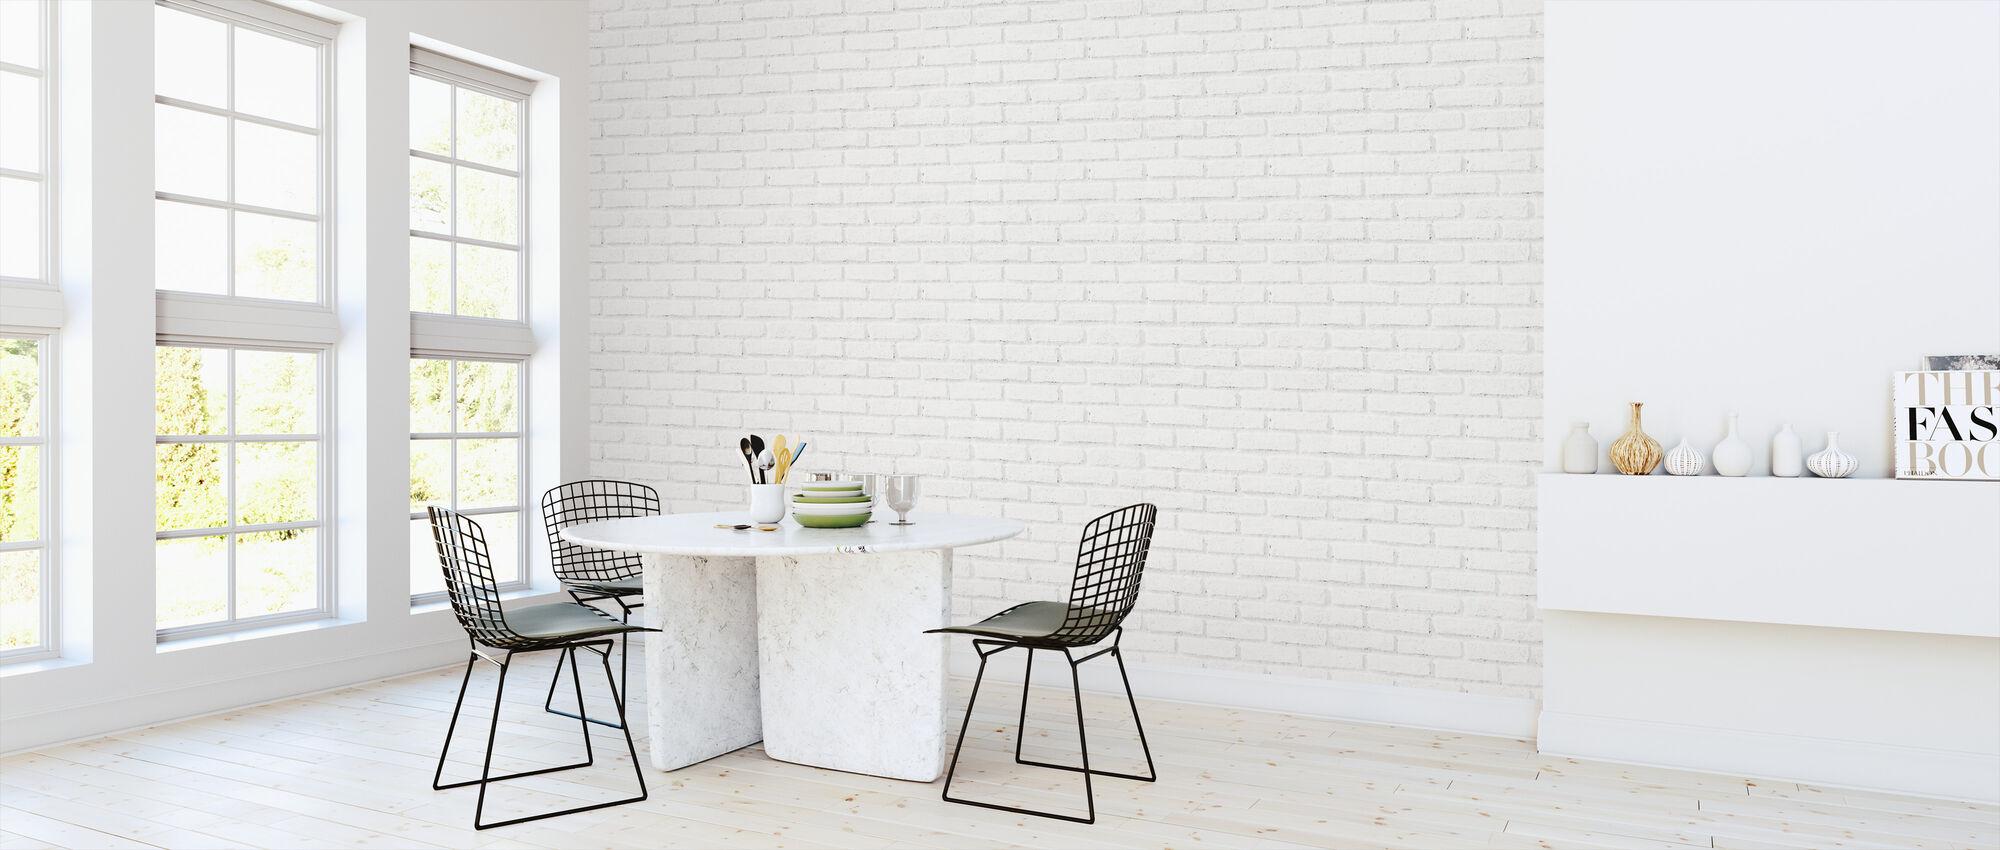 Old White Brick Wall - Wallpaper - Kitchen